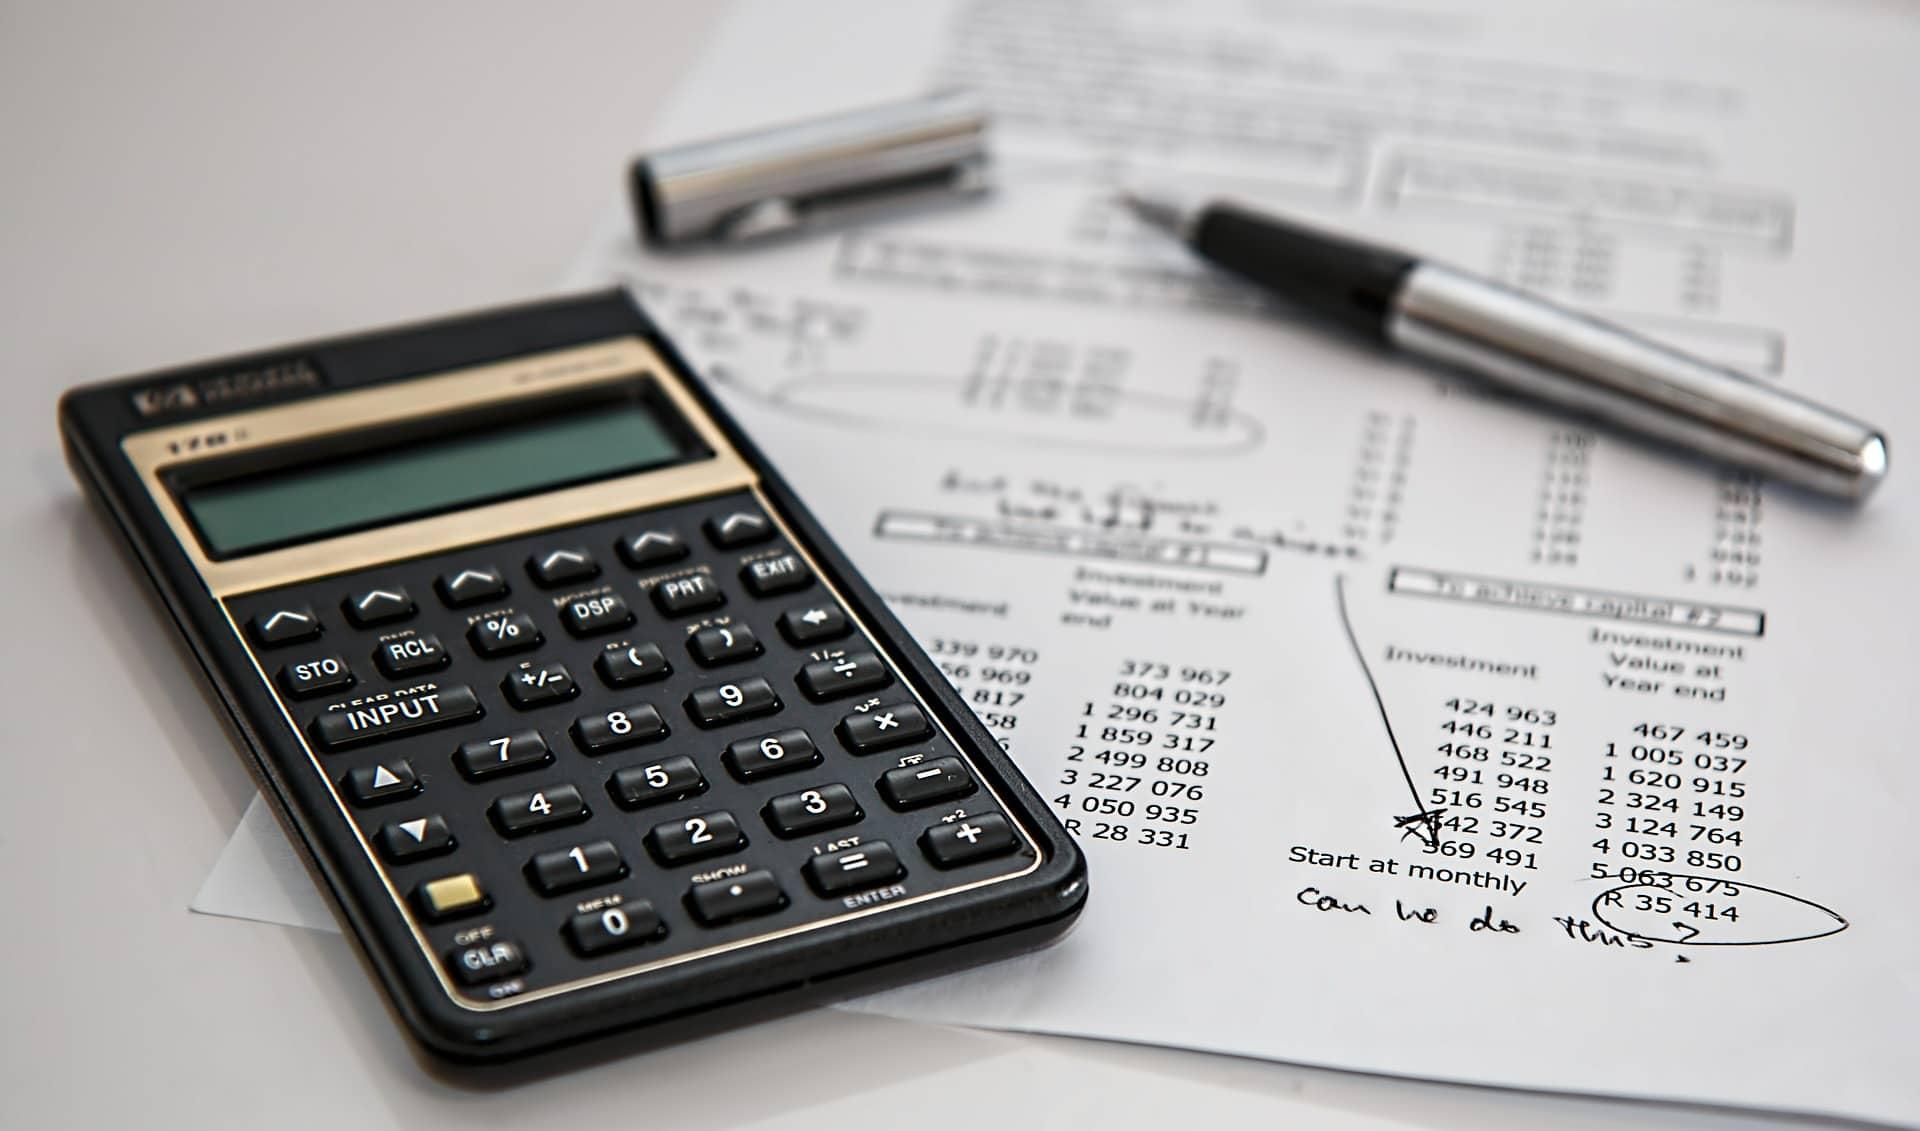 Using SBA 7(a) loans to refinance business debt